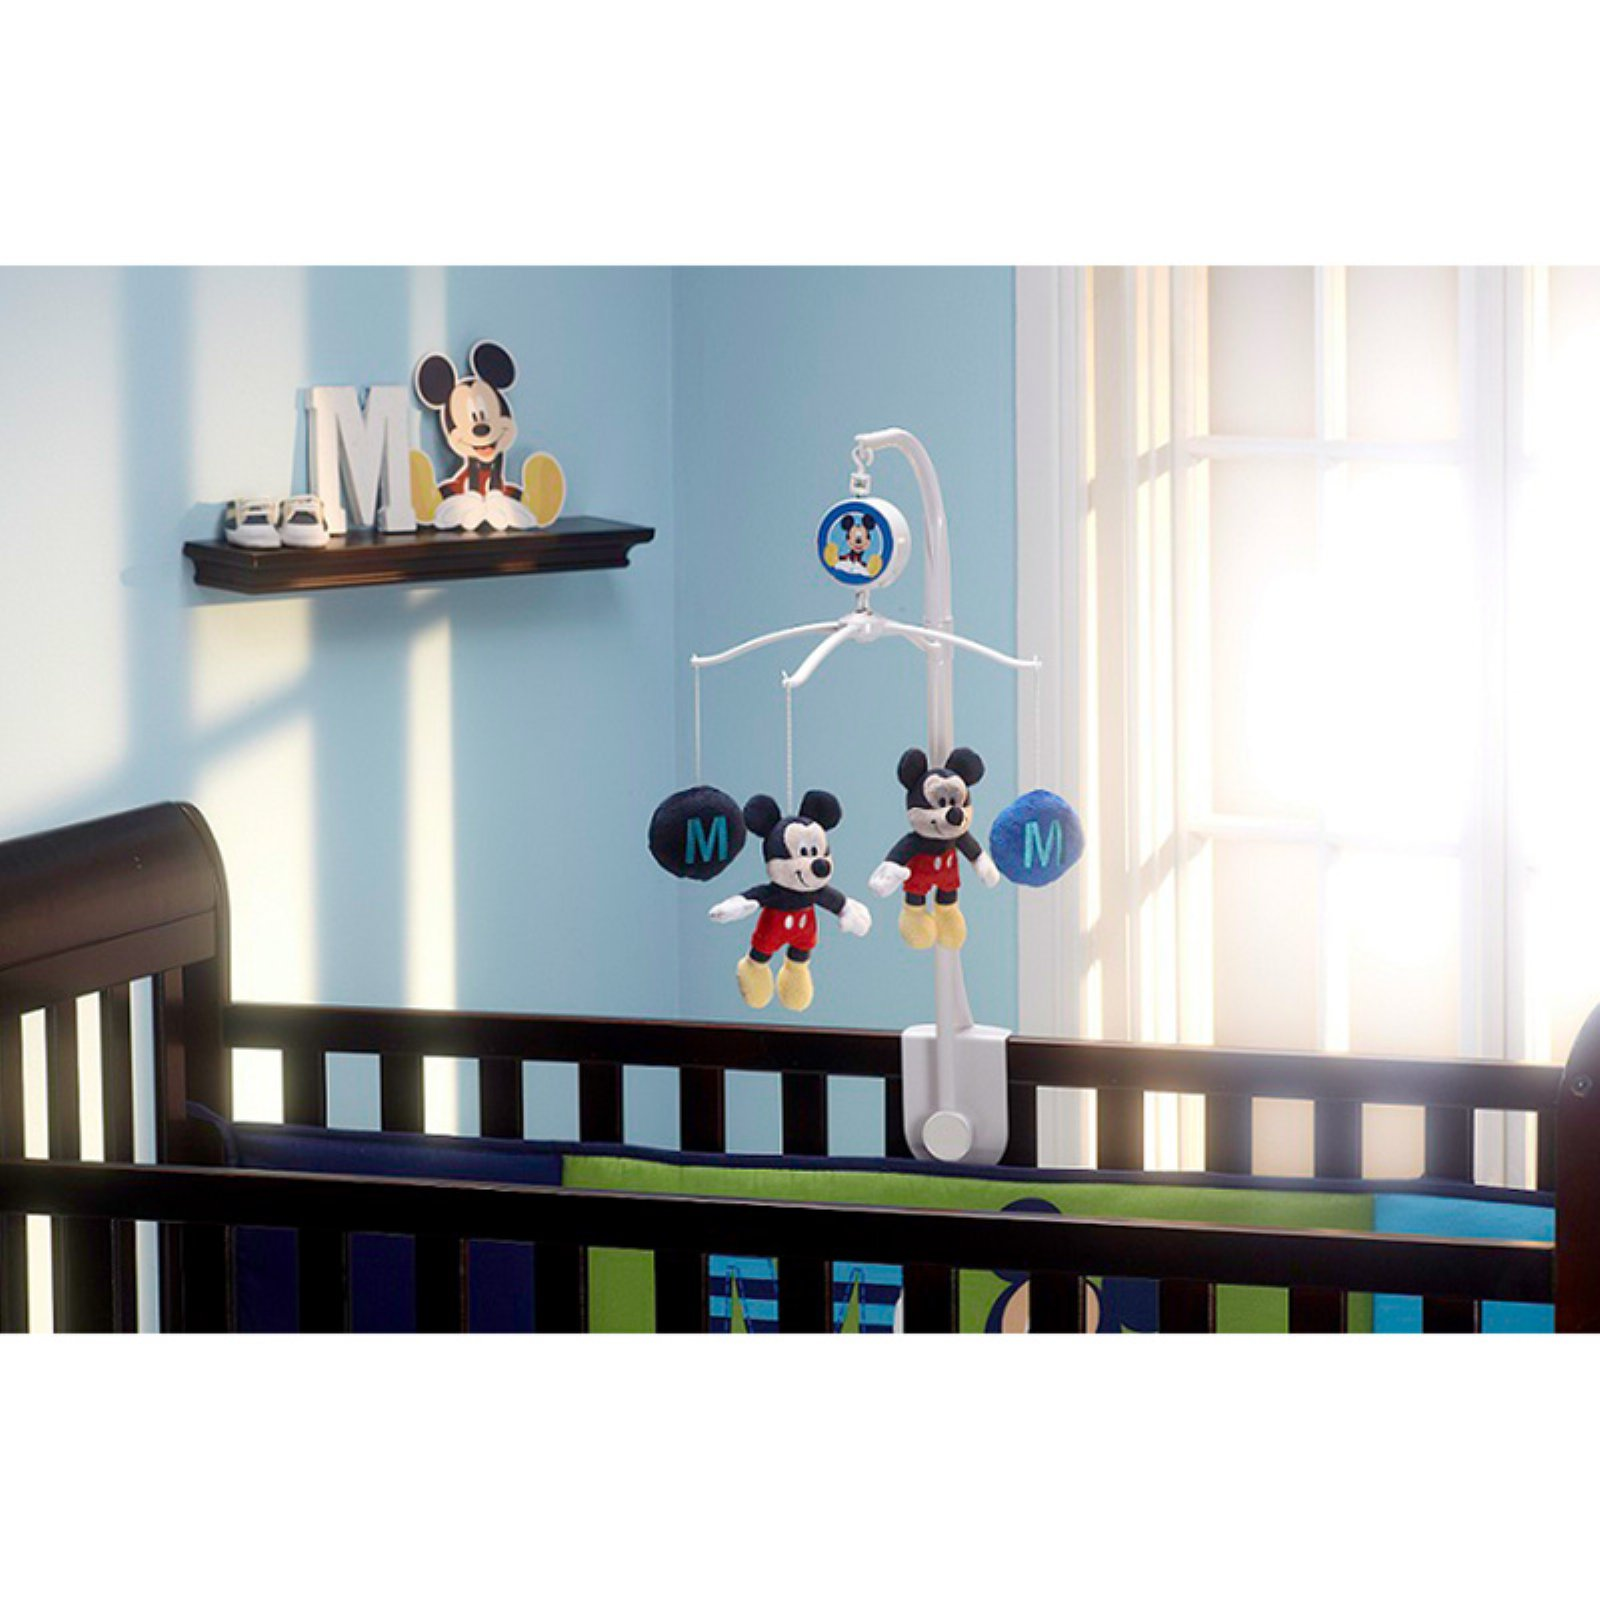 Disney Mickey Mobile by Disney